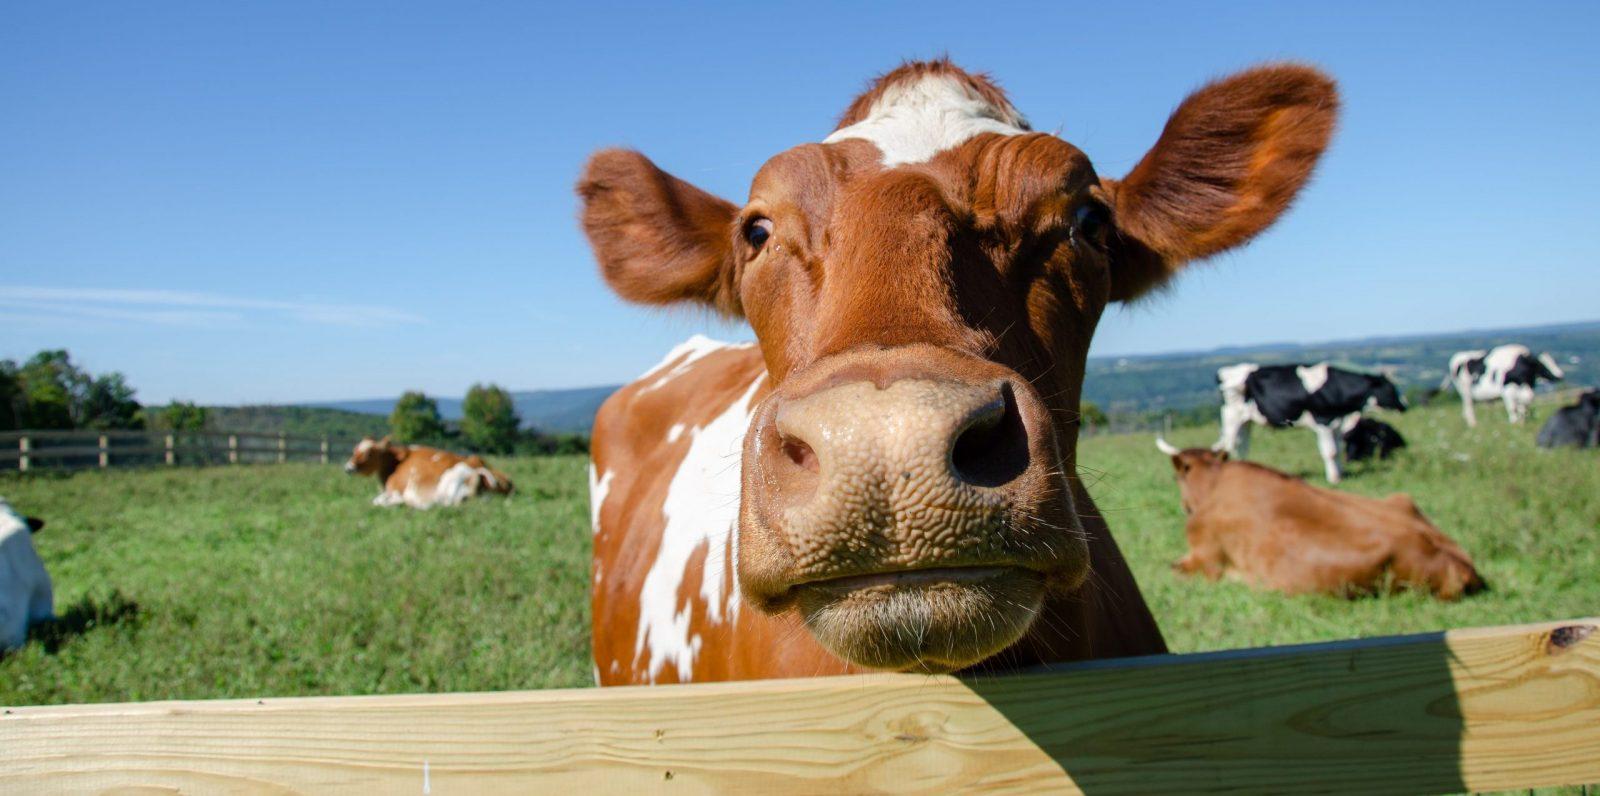 Gary steer at Farm Sanctuary.